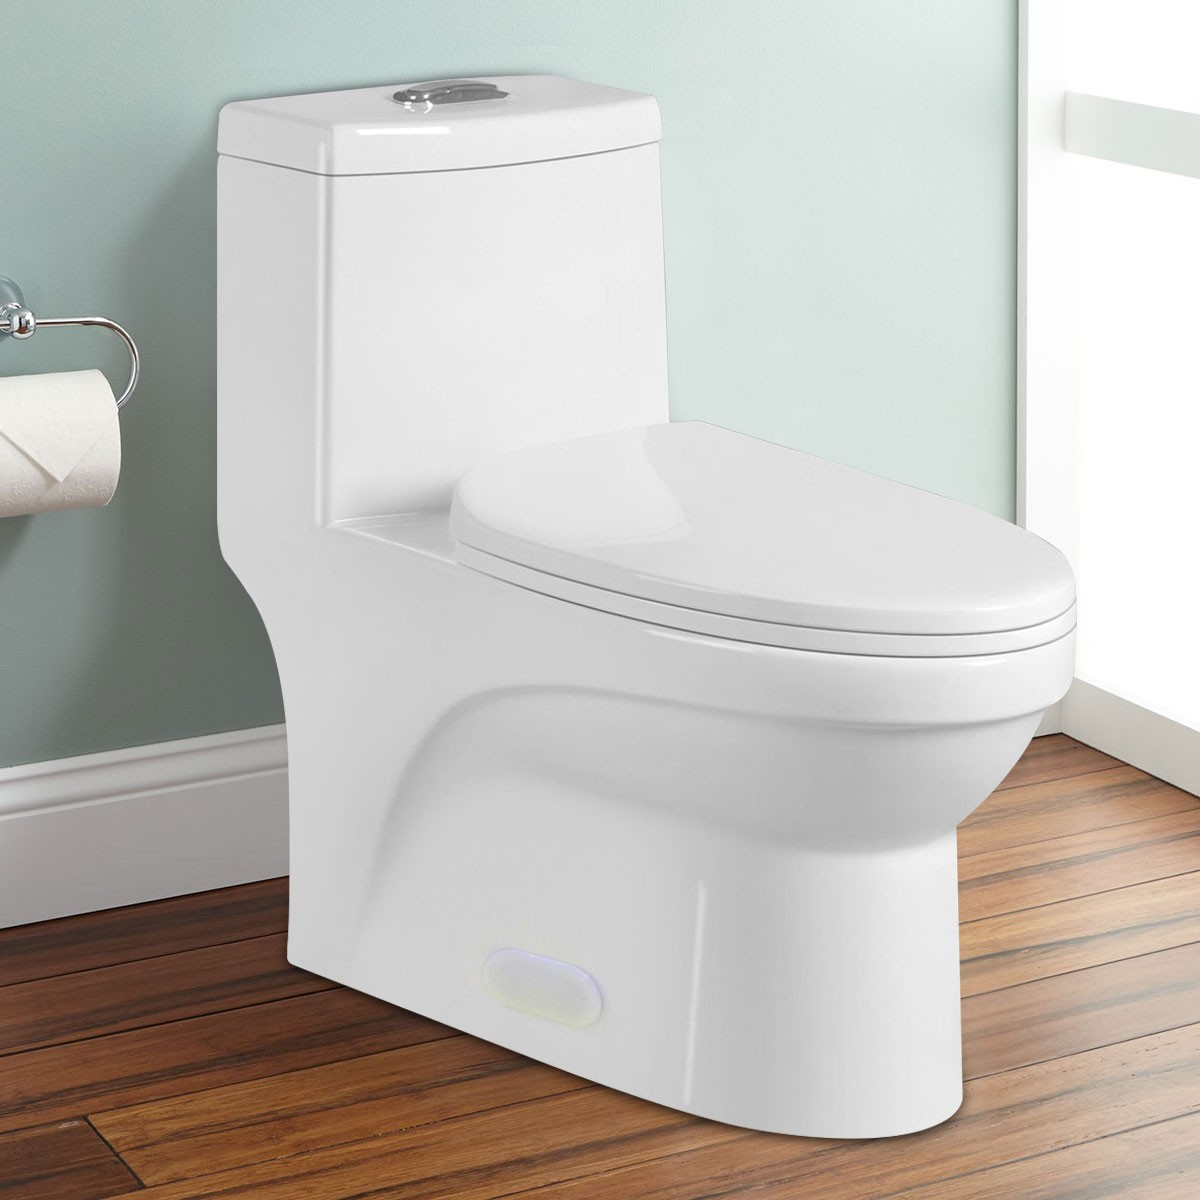 Dual Flush Siphonic One-piece Toilet (DK-ZBQ-12050A)